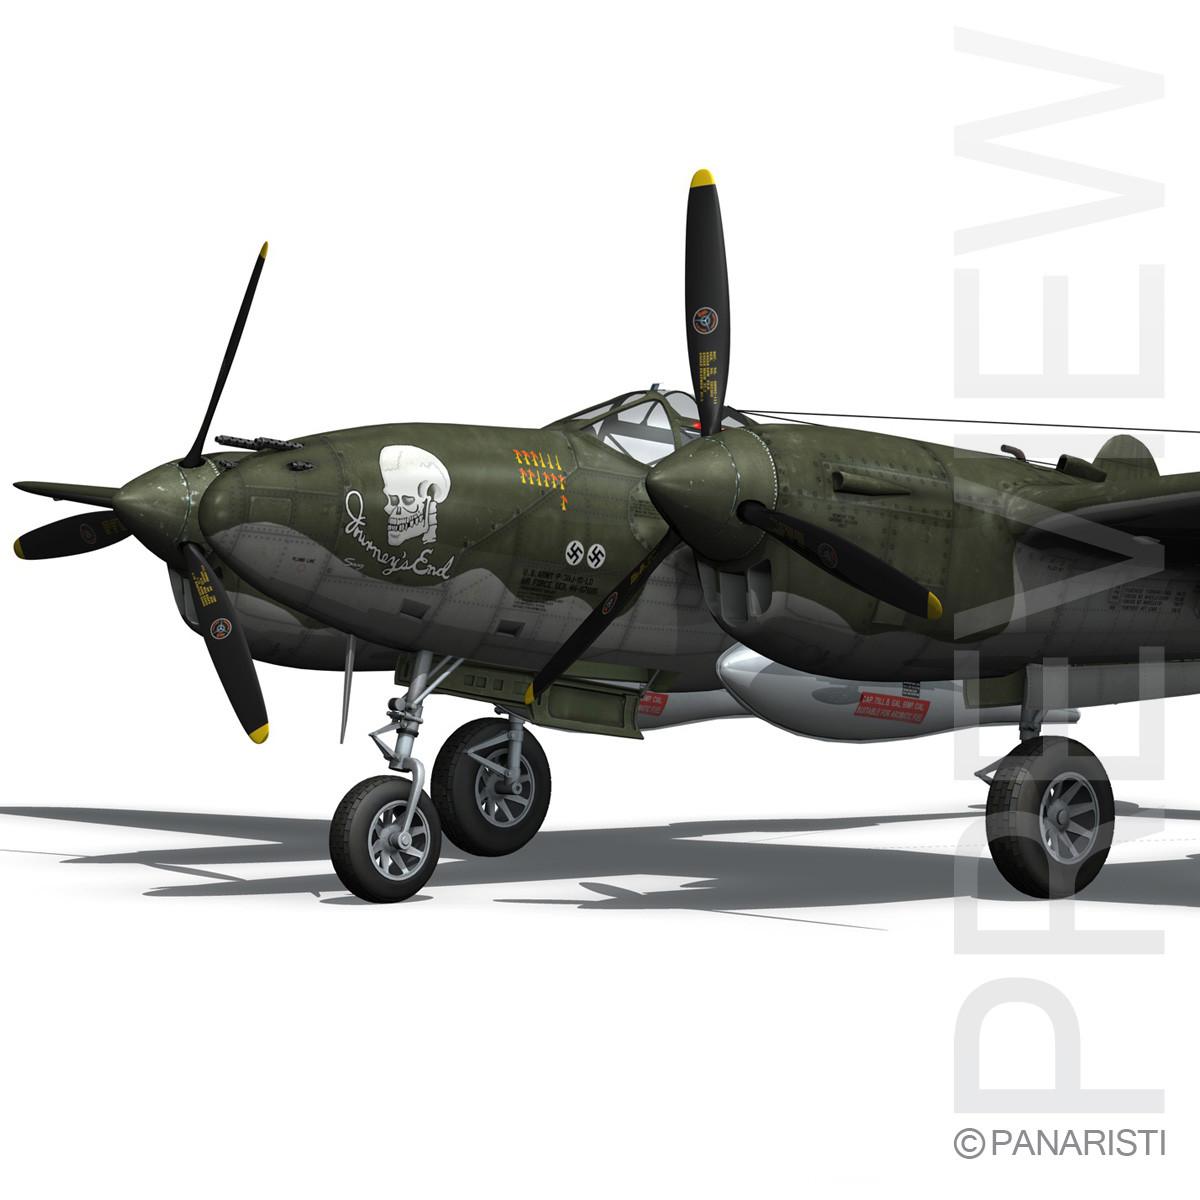 Lockheed P-38 Lightning - Journeys End